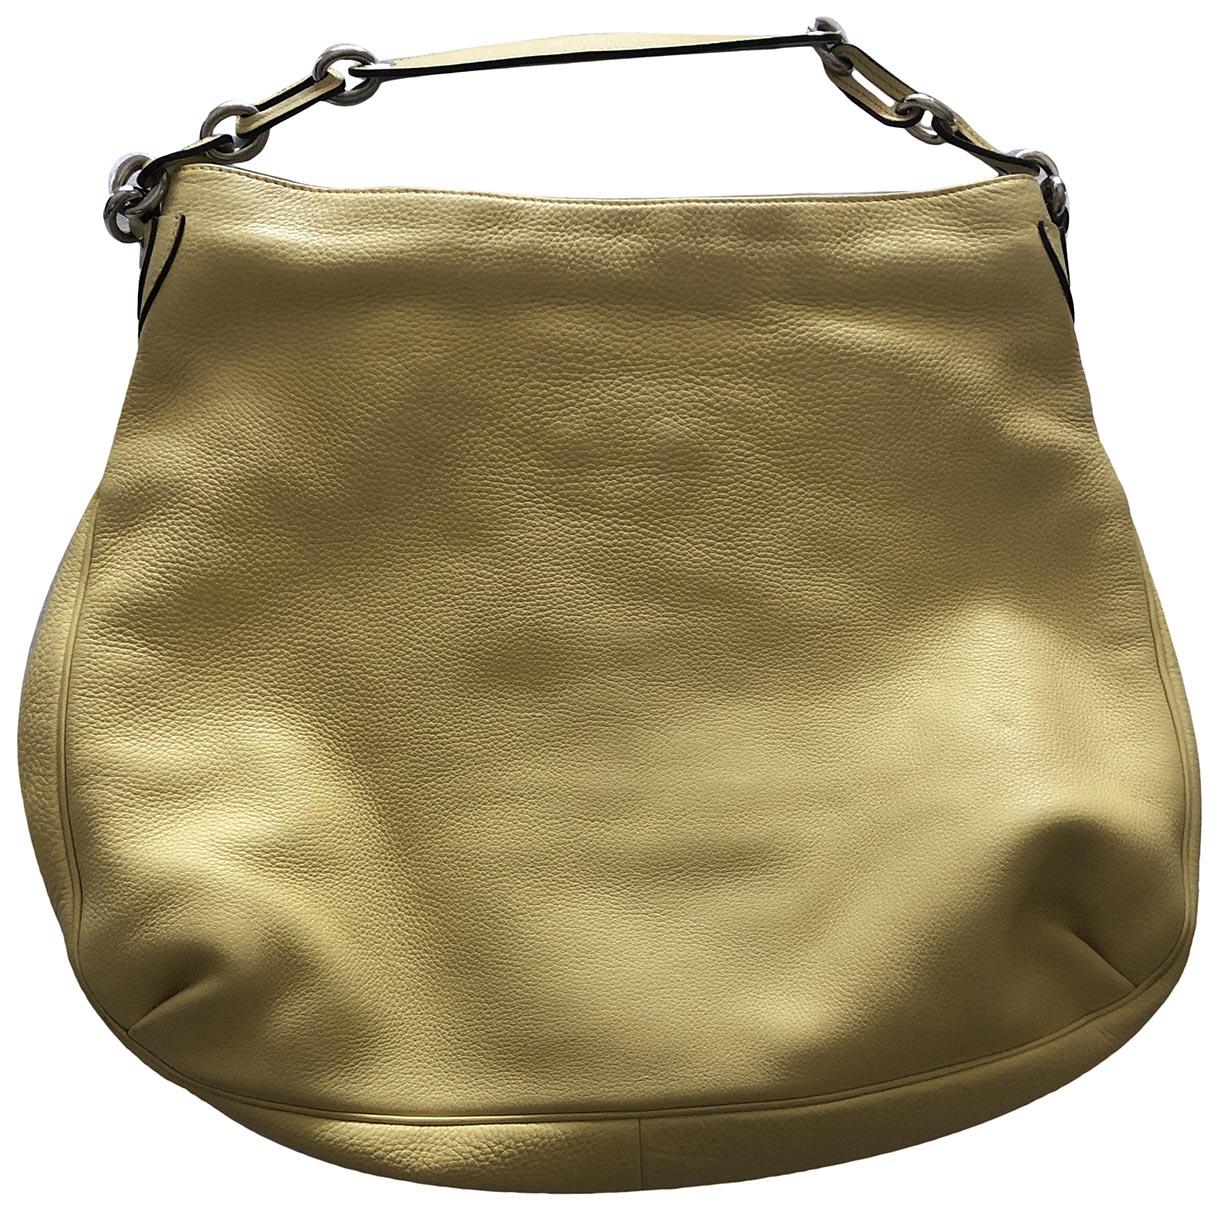 Marc Jacobs \N Yellow Leather handbag for Women \N